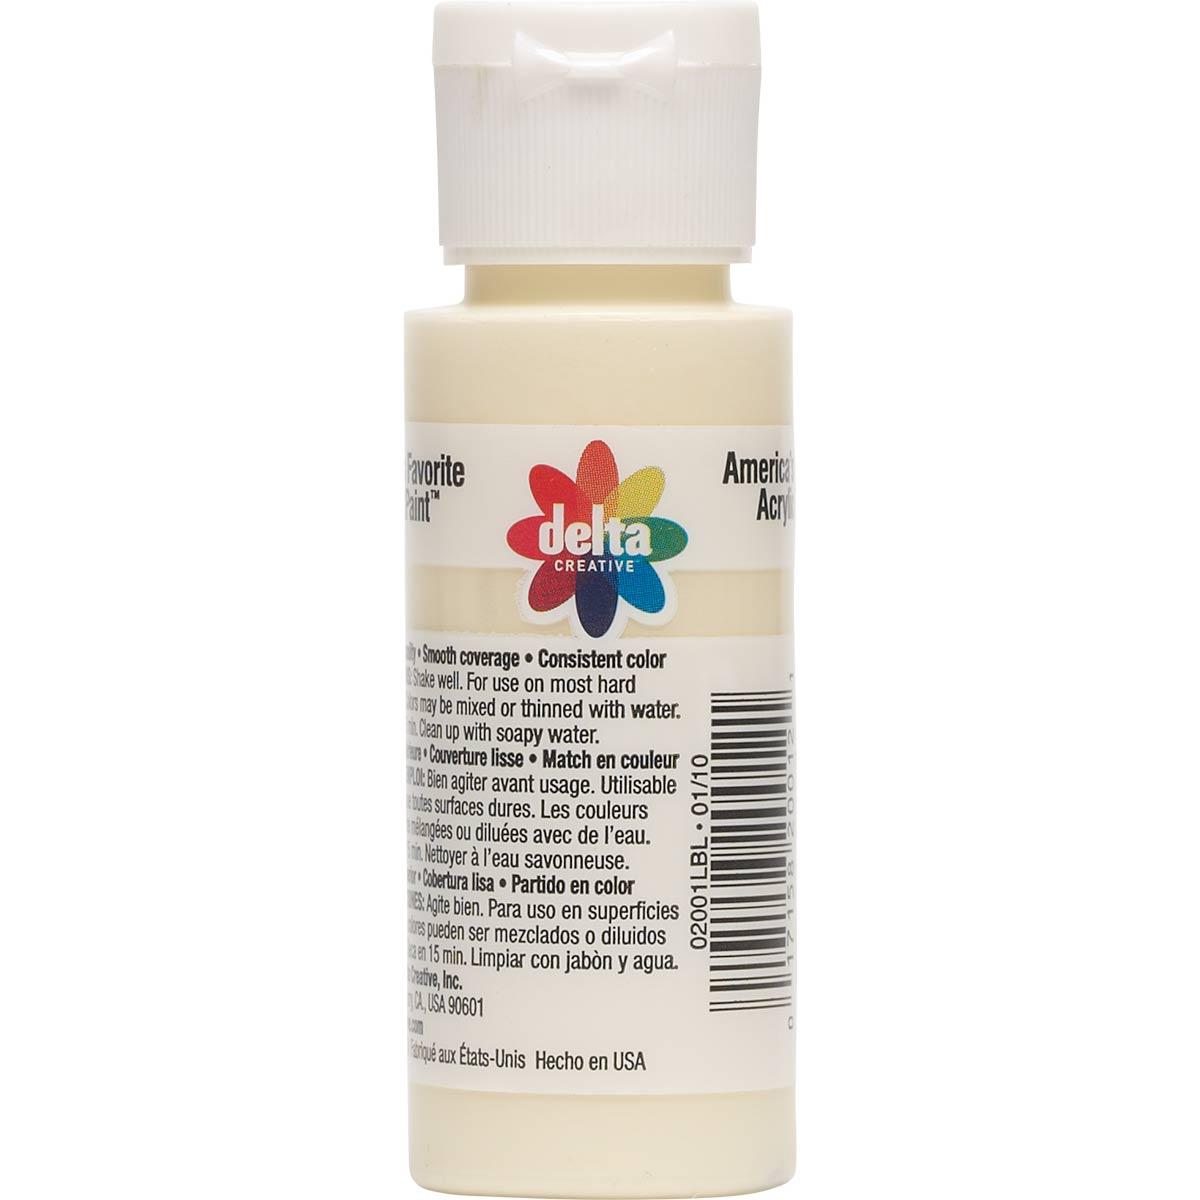 Delta Ceramcoat ® Acrylic Paint - Antique White, 2 oz.